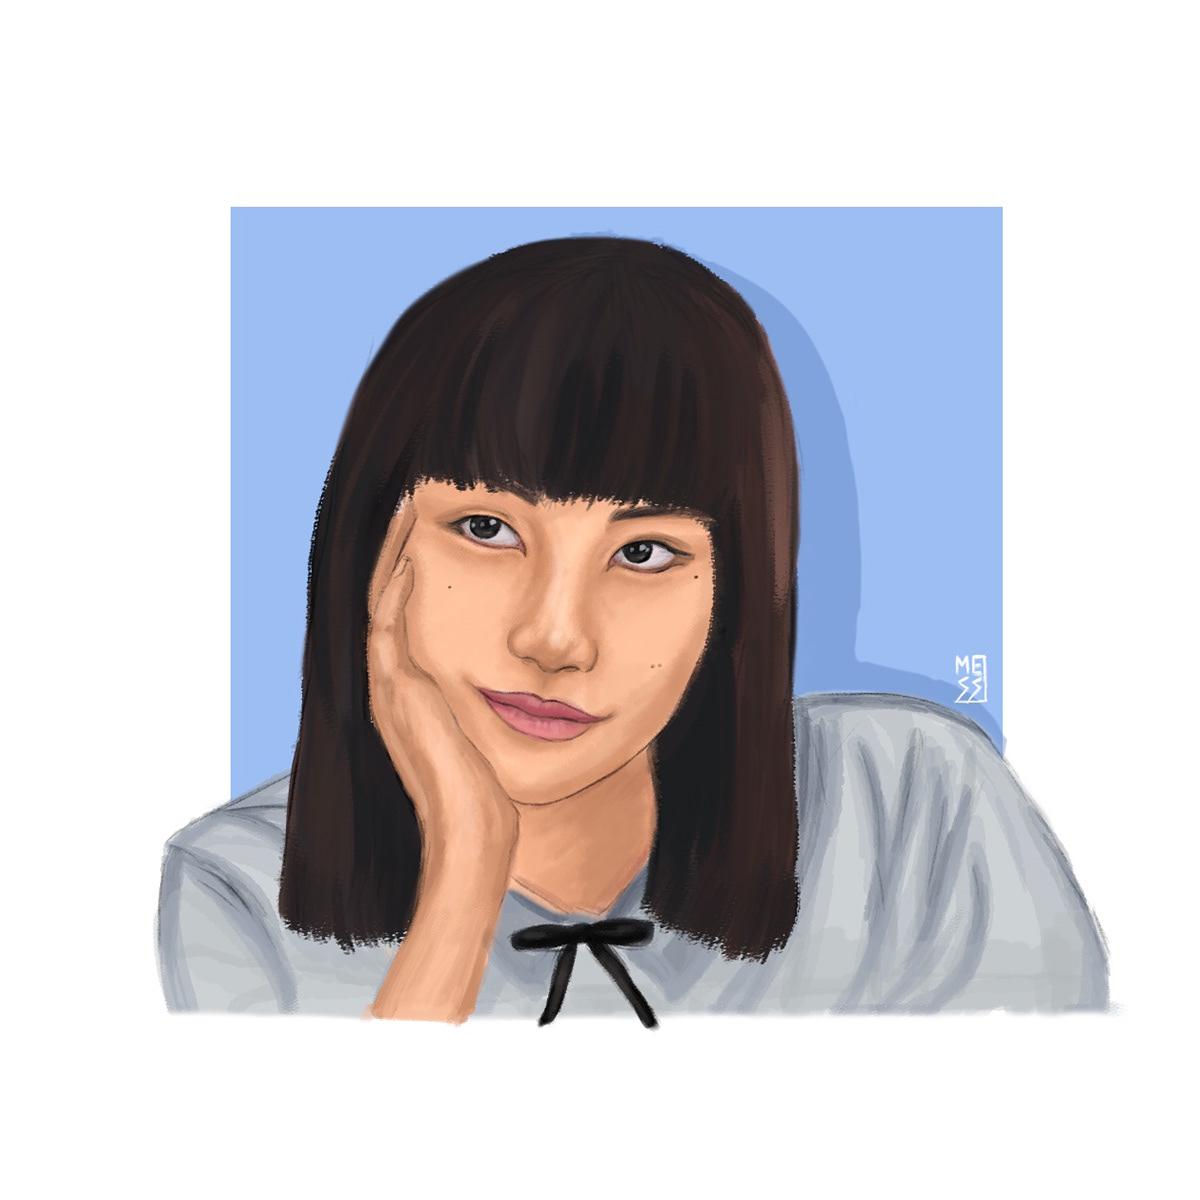 Digital Art  Drawing  fanart girl from nowhere ILLUSTRATION  Nanno Netflix